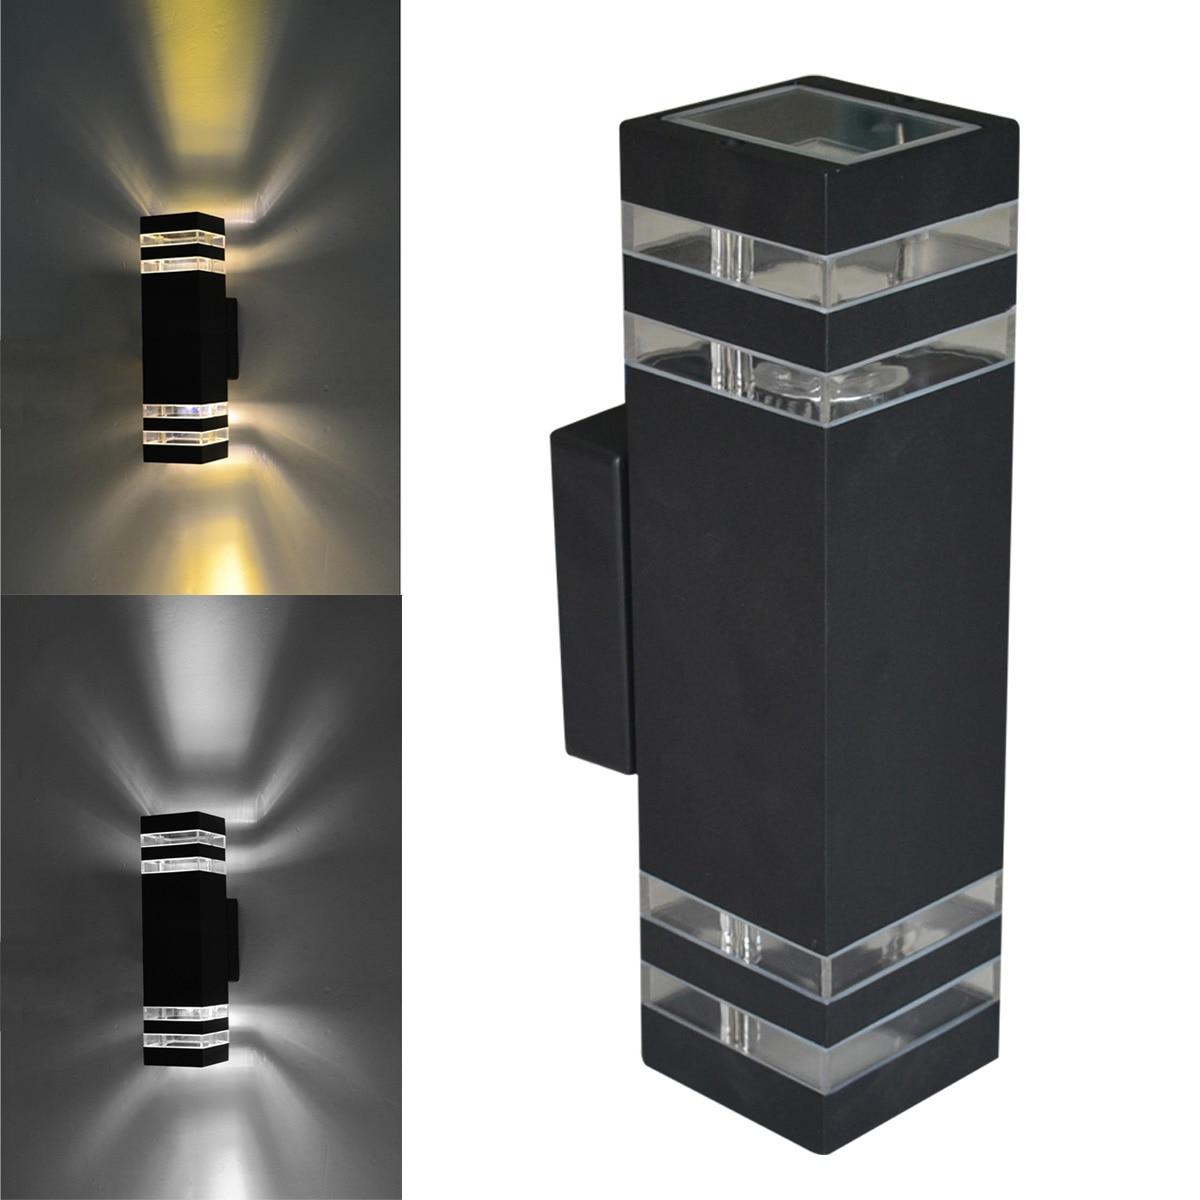 online get cheap porch light lowes aliexpresscom  alibaba group - jiawen pcslot modern outdoor wall lighting  outdoor wall lamp  ledporch